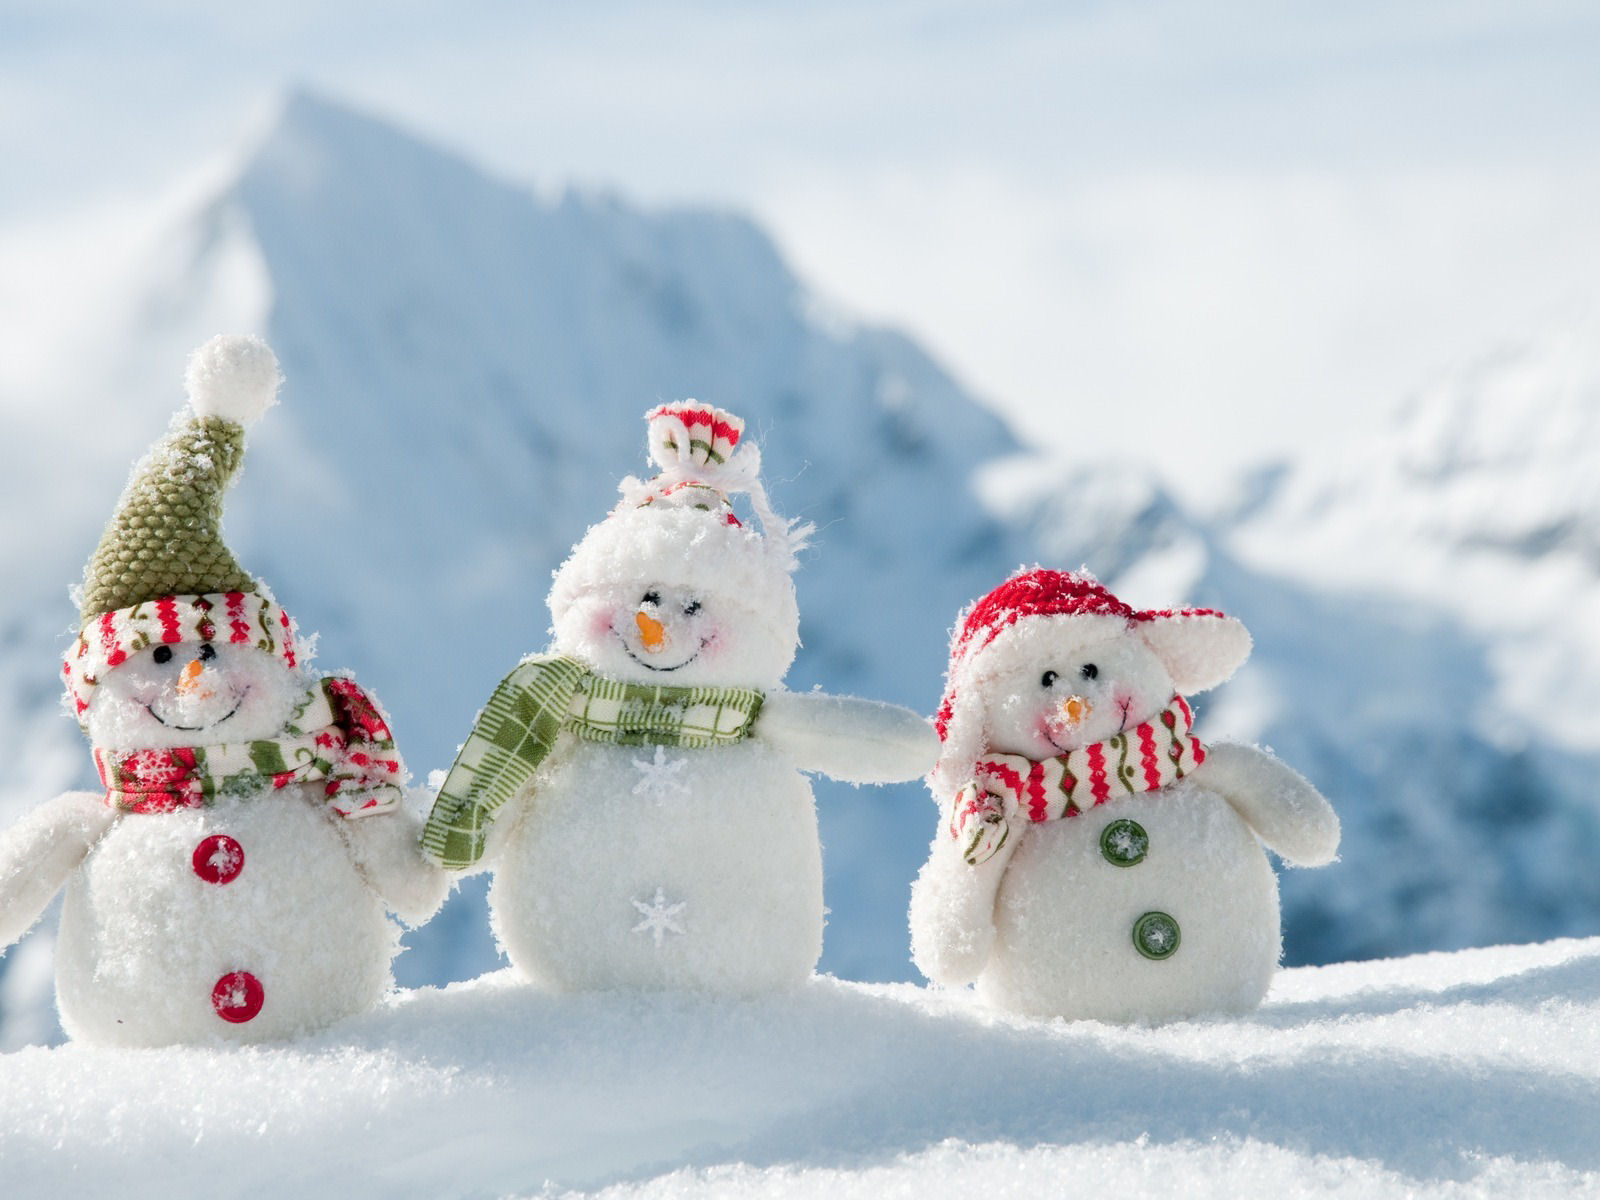 Christmas Wallpaper 16206 1600x1200px 1600x1200